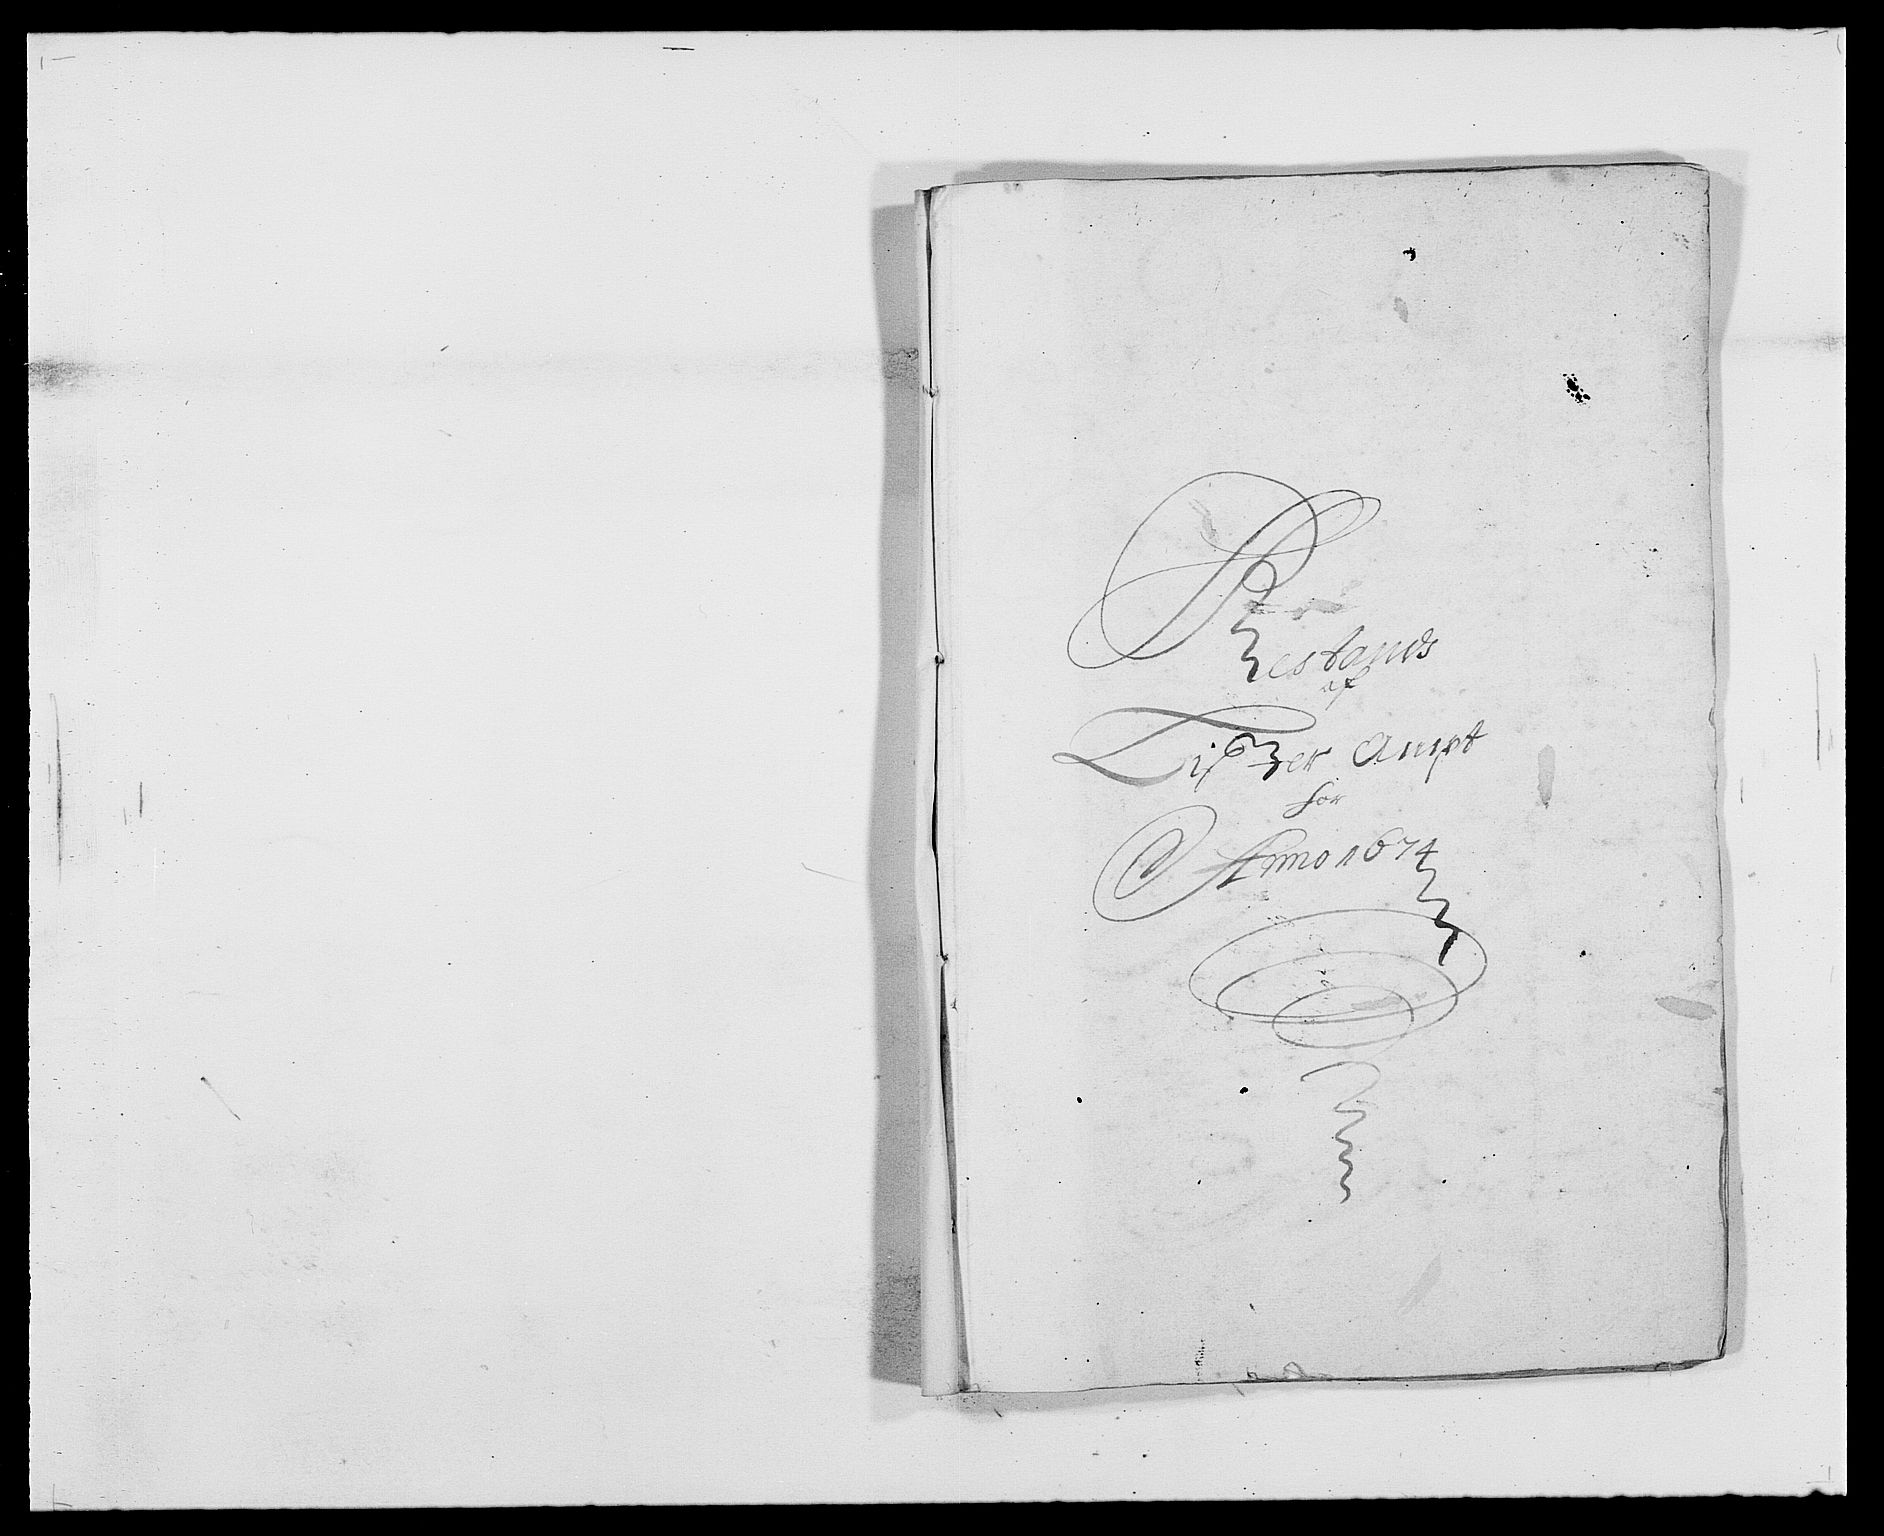 RA, Rentekammeret inntil 1814, Reviderte regnskaper, Fogderegnskap, R41/L2528: Fogderegnskap Lista, 1673-1674, s. 295